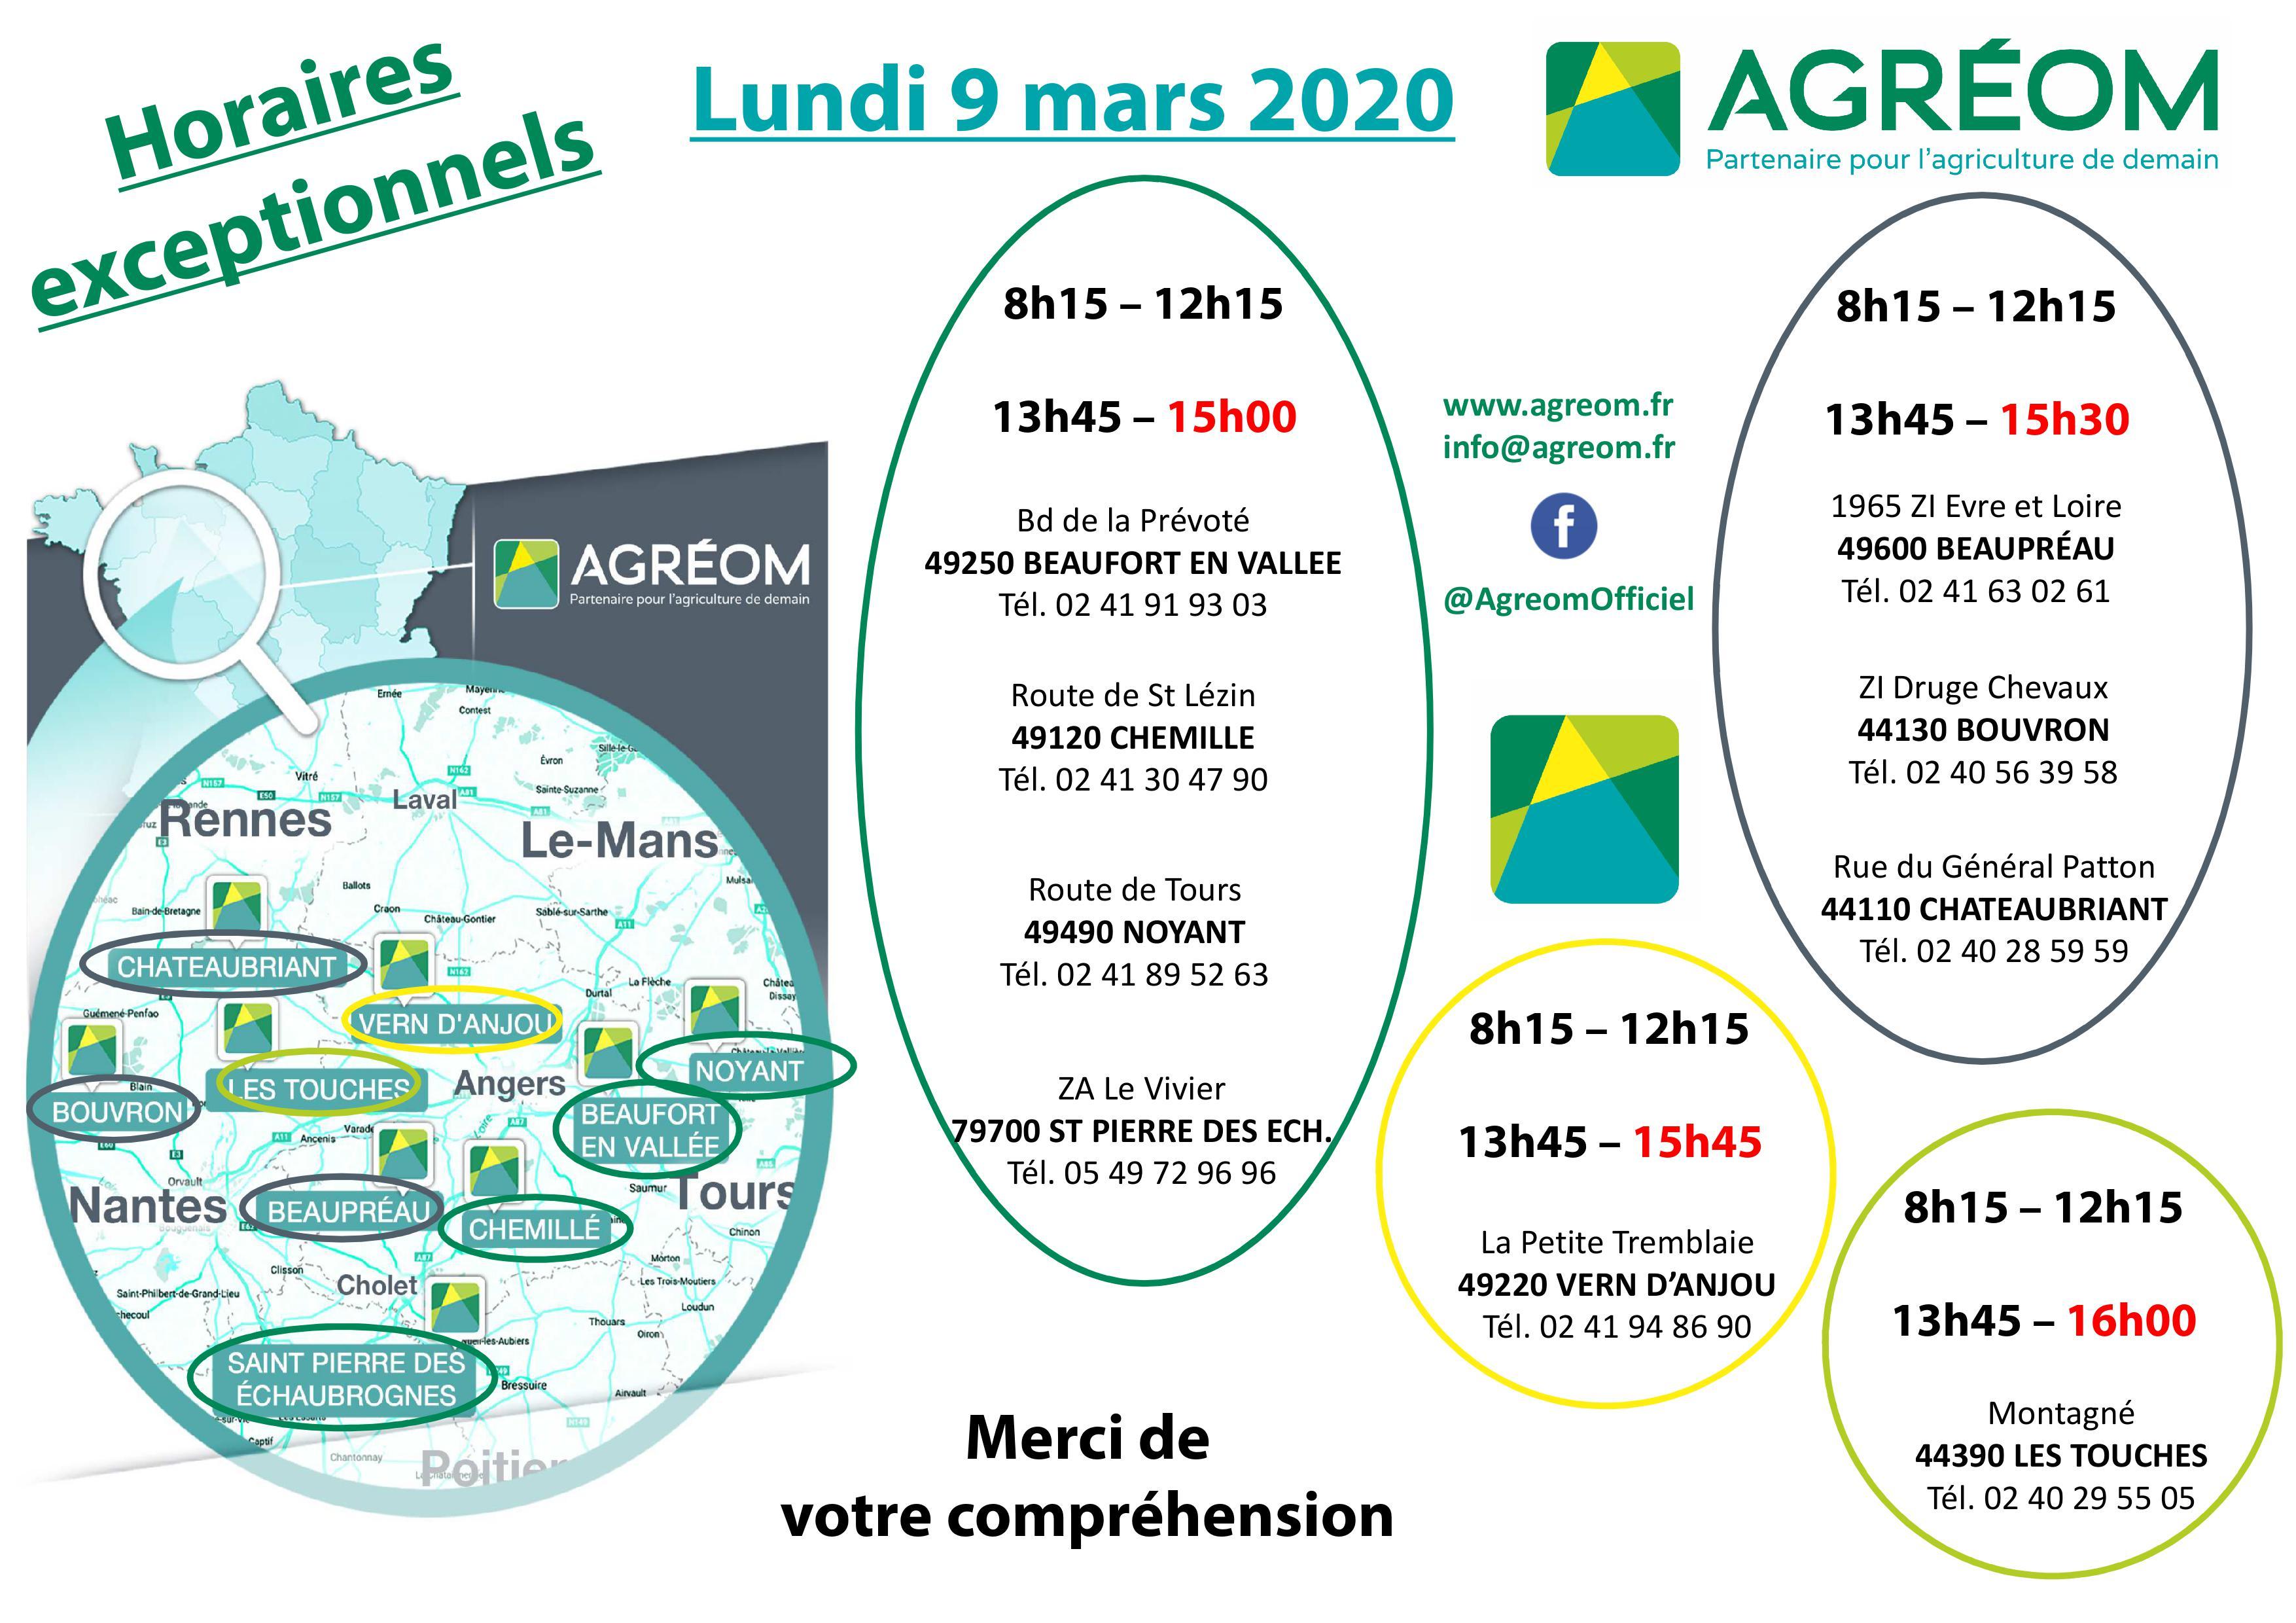 HORAIRES AGRÉOM LUNDI 9 MARS 2020